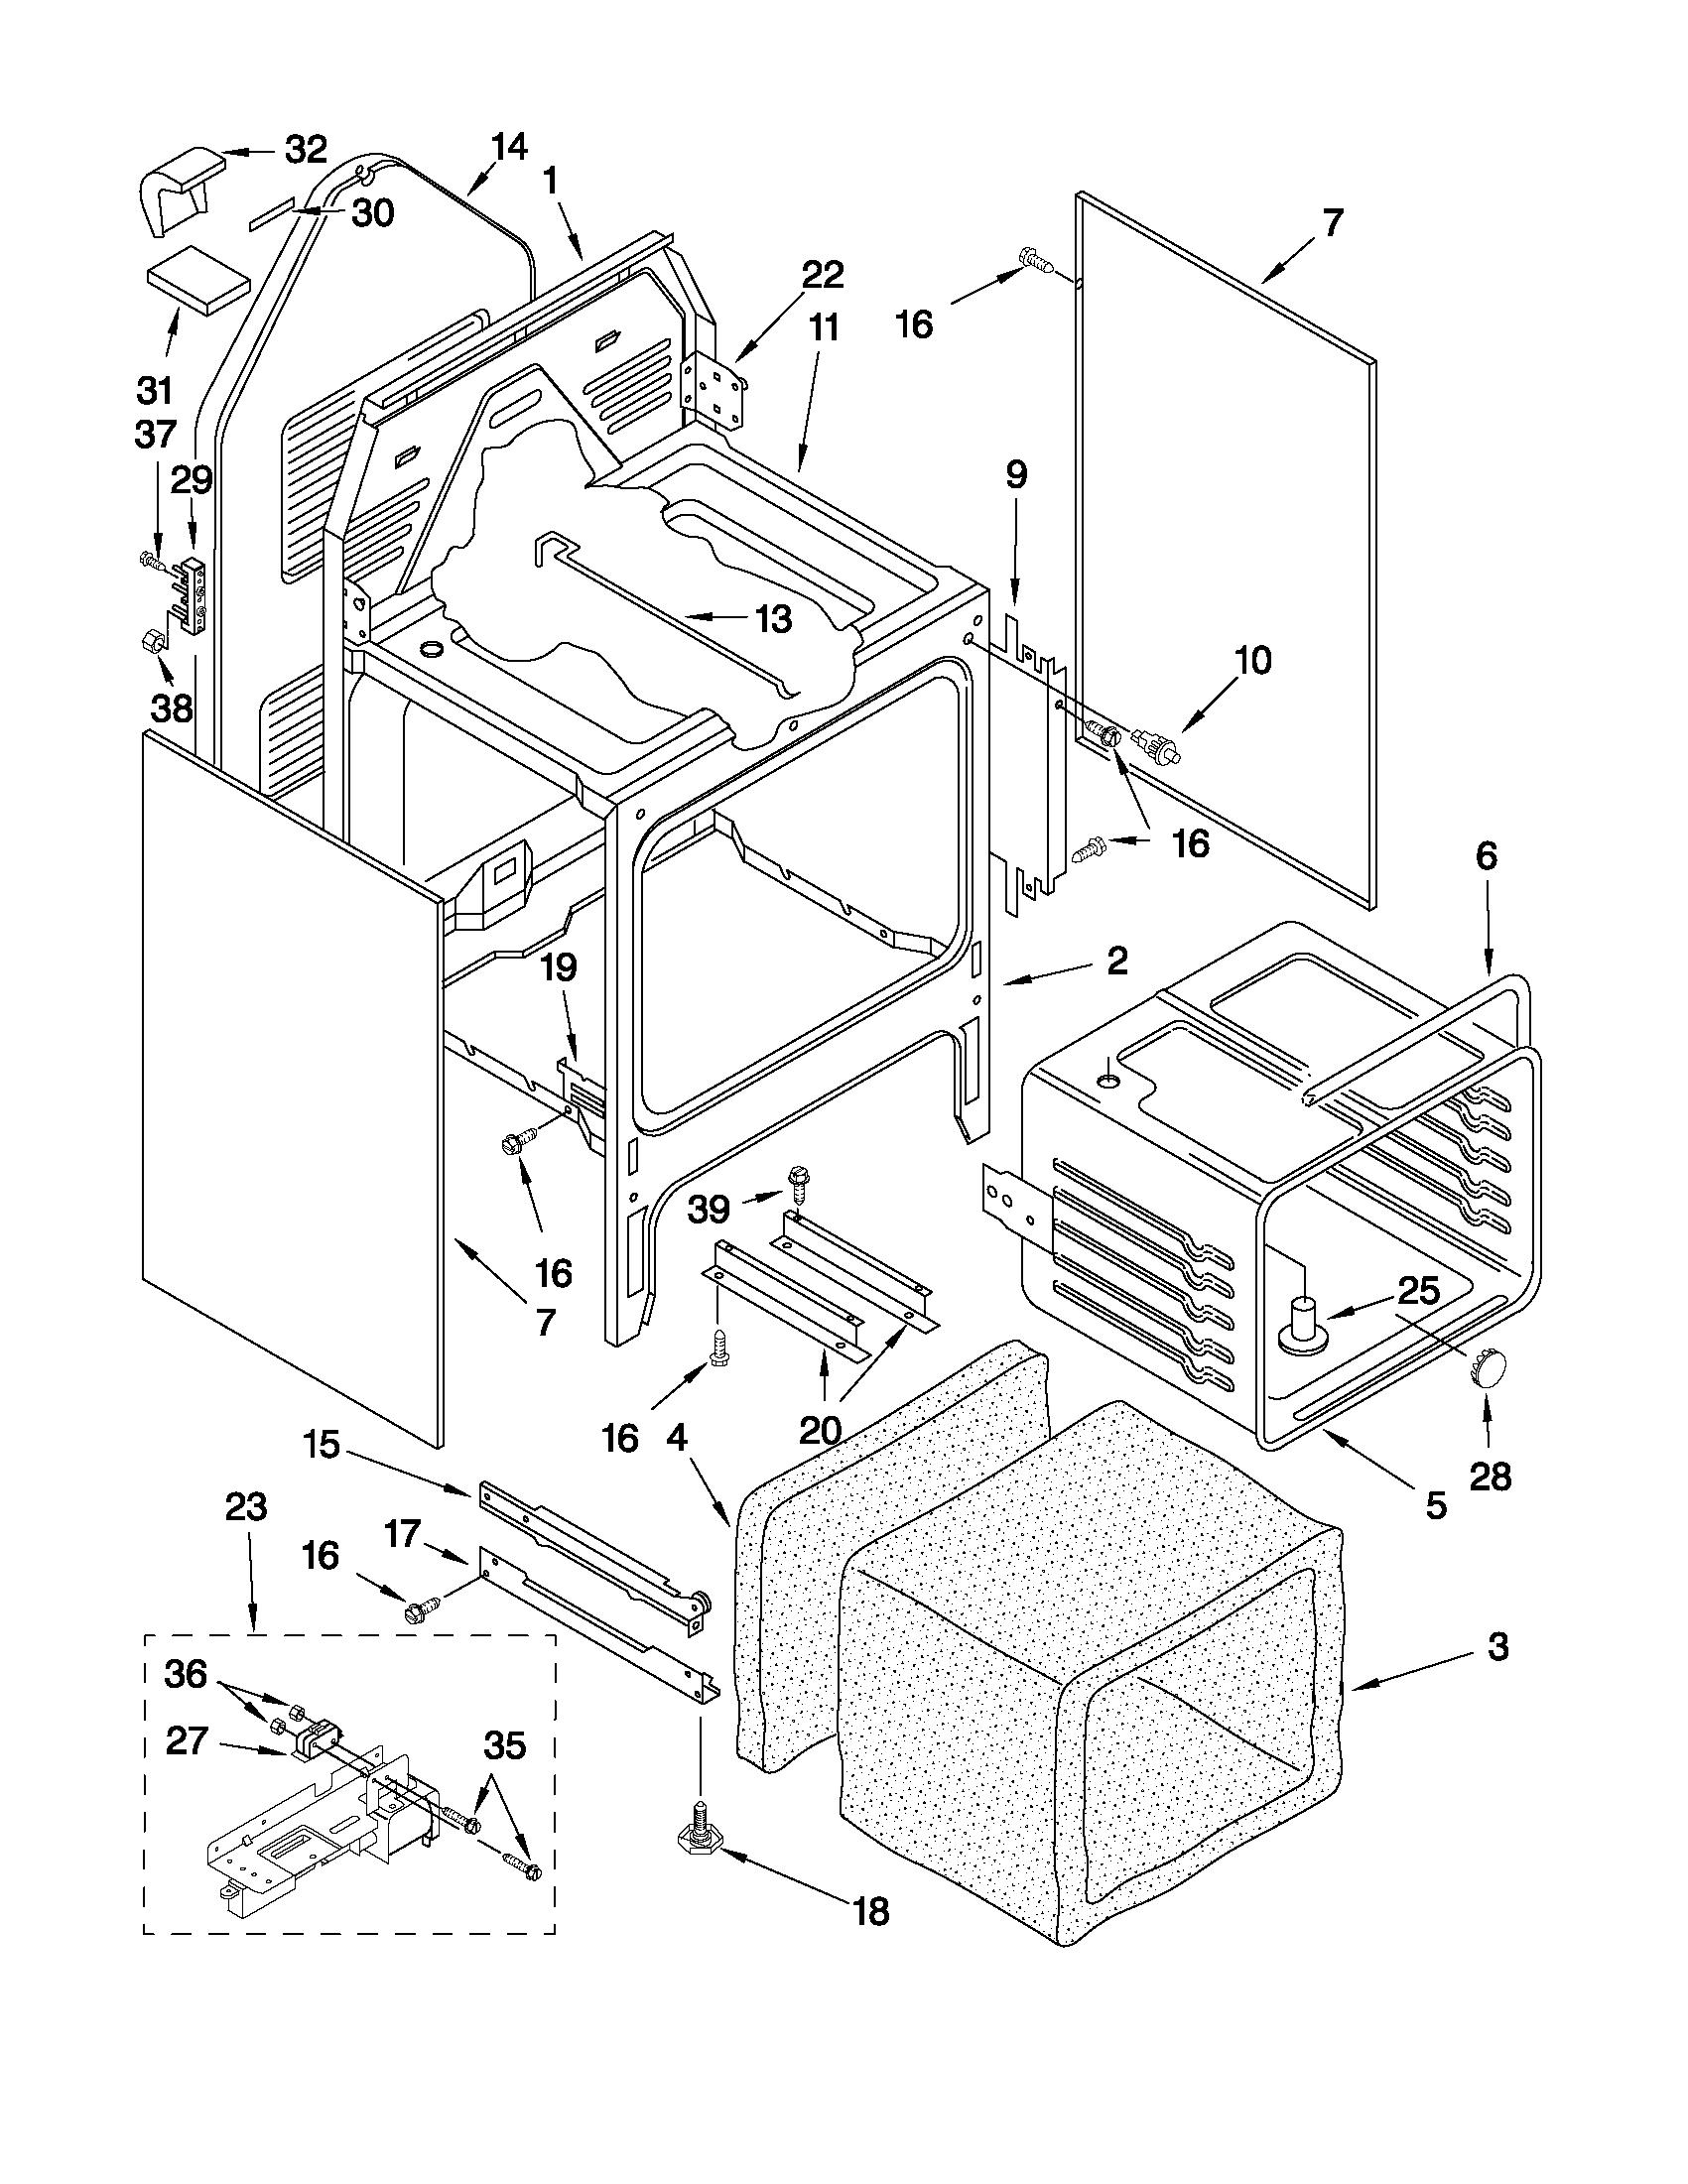 Whirlpool Gjsp84902 Free Standing - Electric Timer - Stove Clocks - Ge Dryer Wiring Diagram